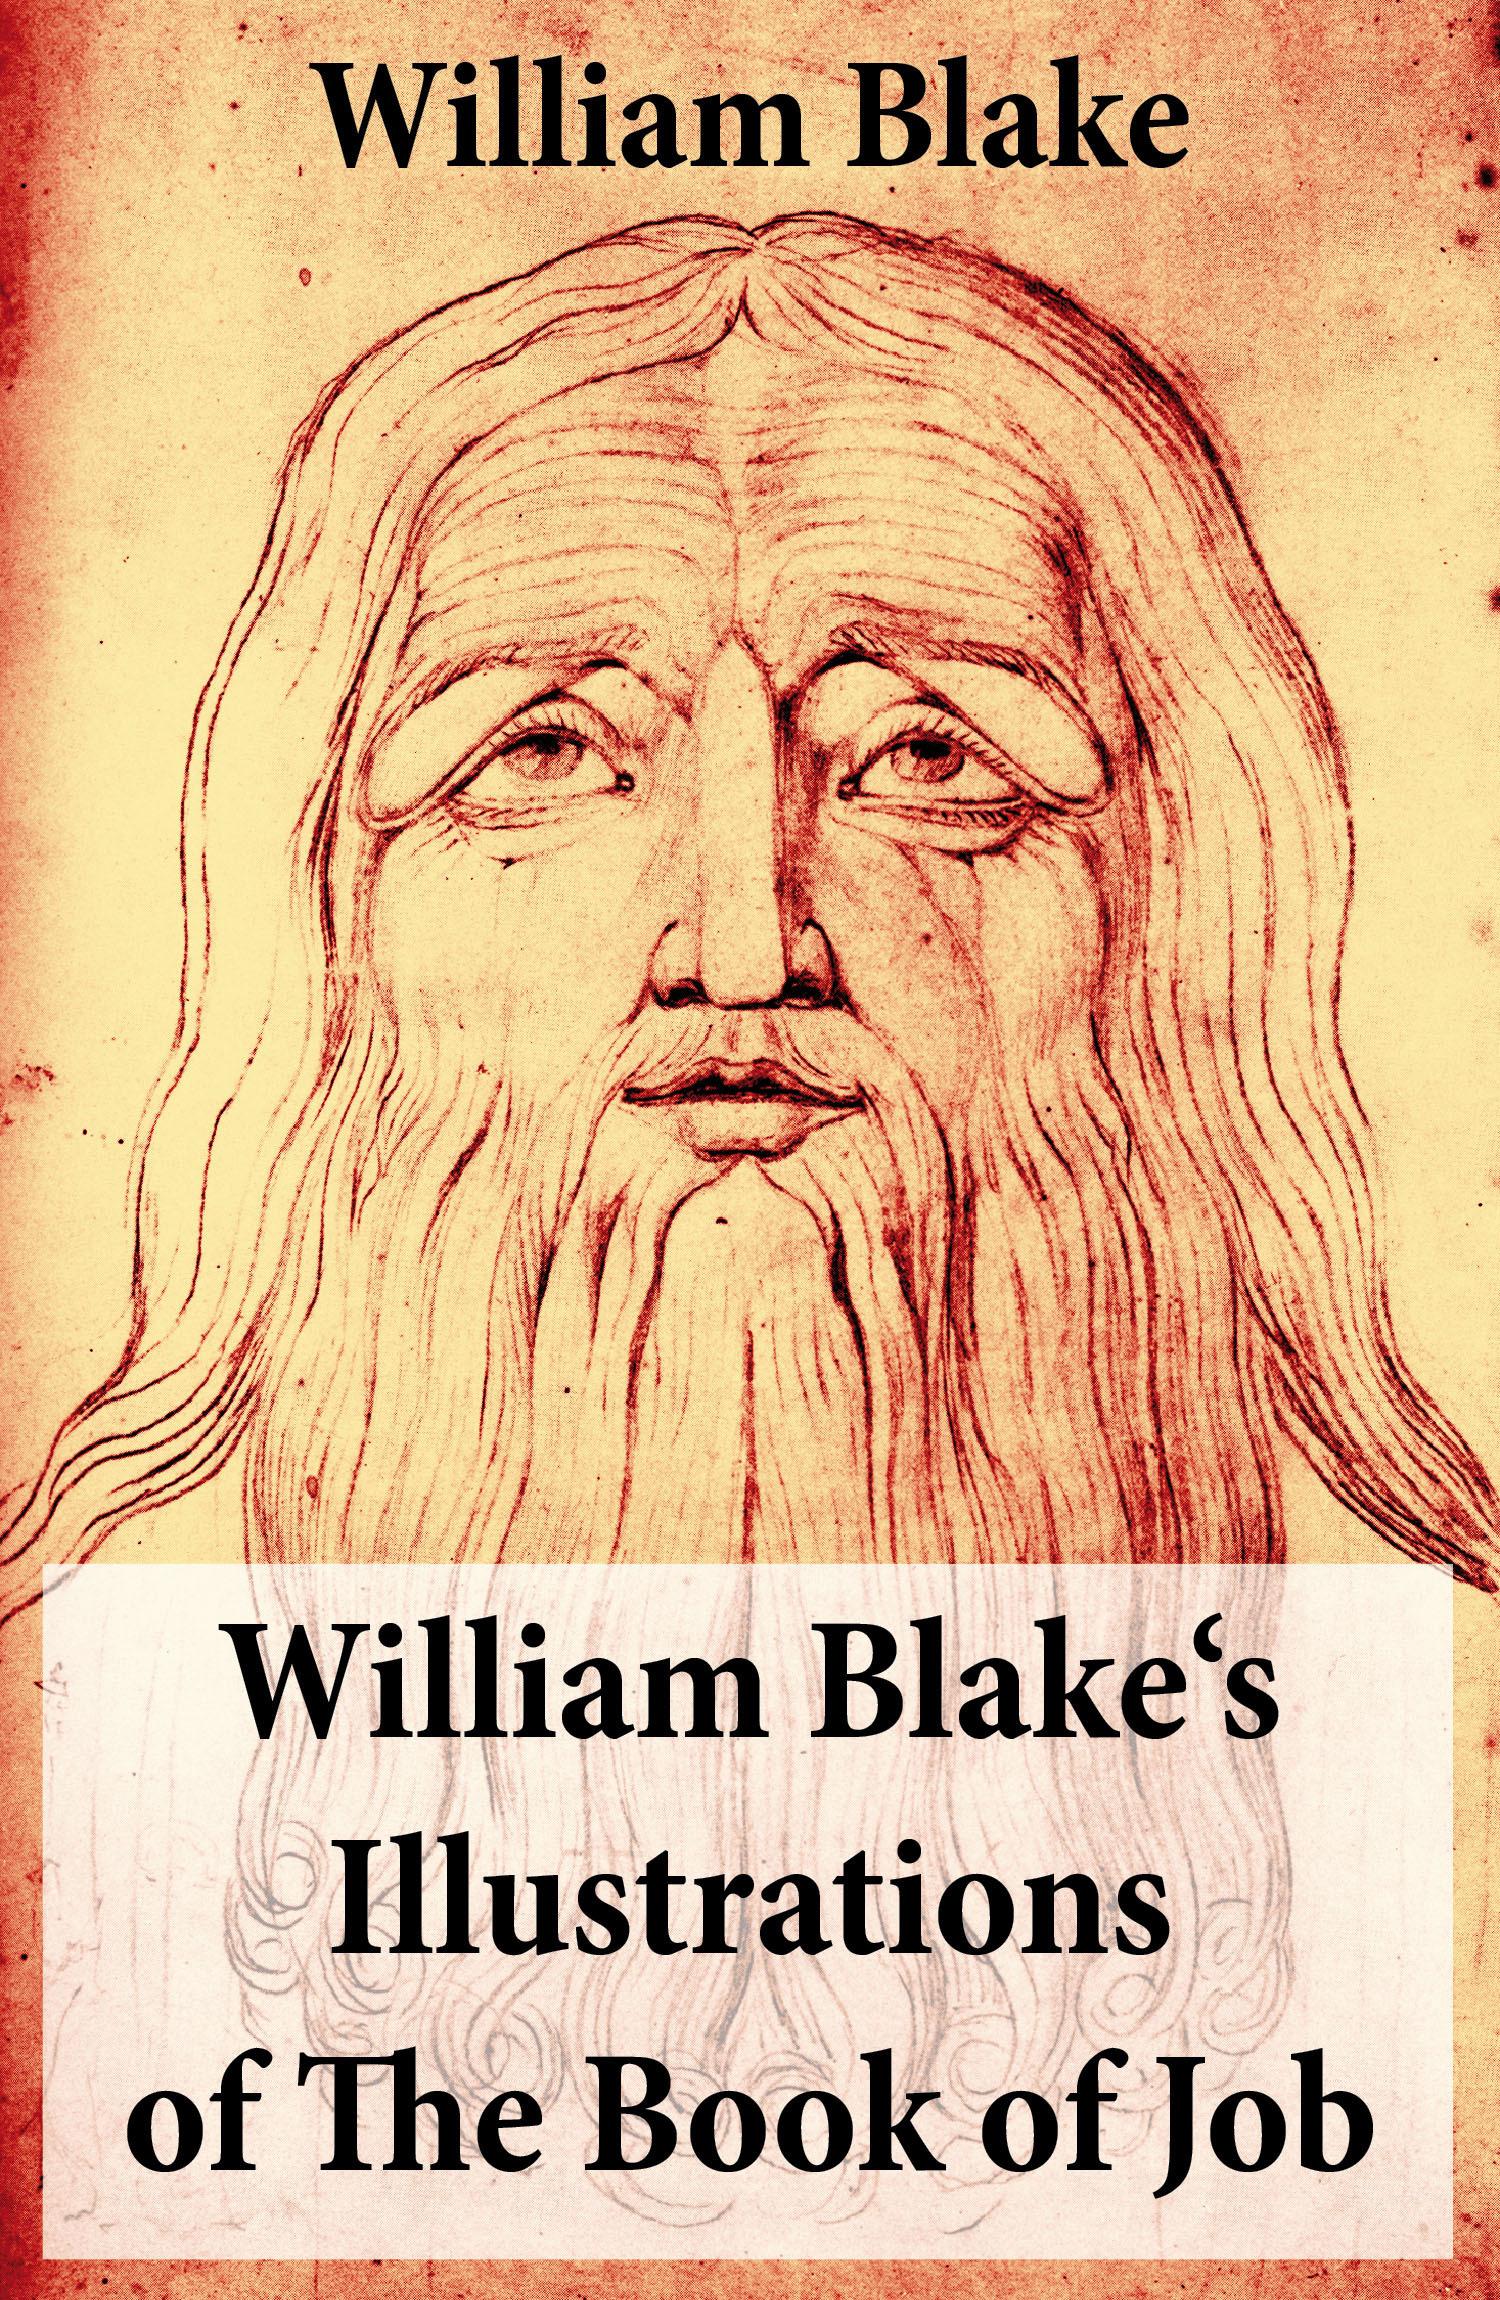 William Blake's Illustrations of The Book of Job (Illuminated Manuscript with the Original Illustrations of William Blake)